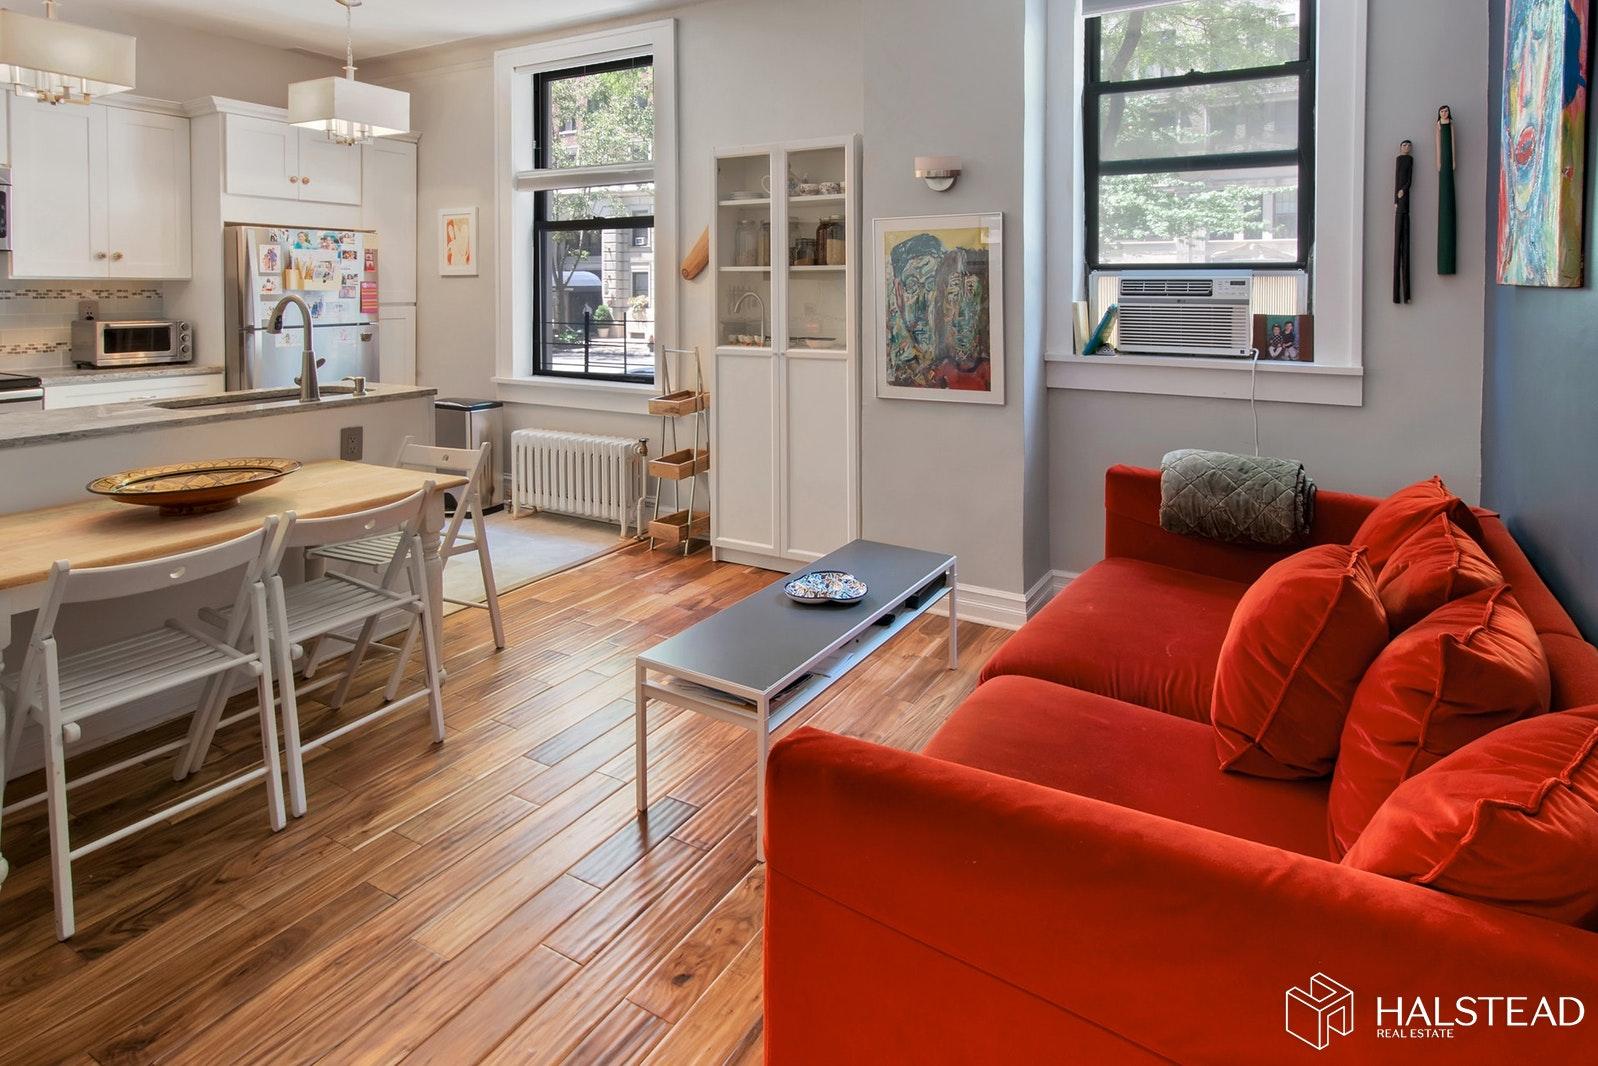 Apartment for sale at 514 West End Avenue, Apt 1B